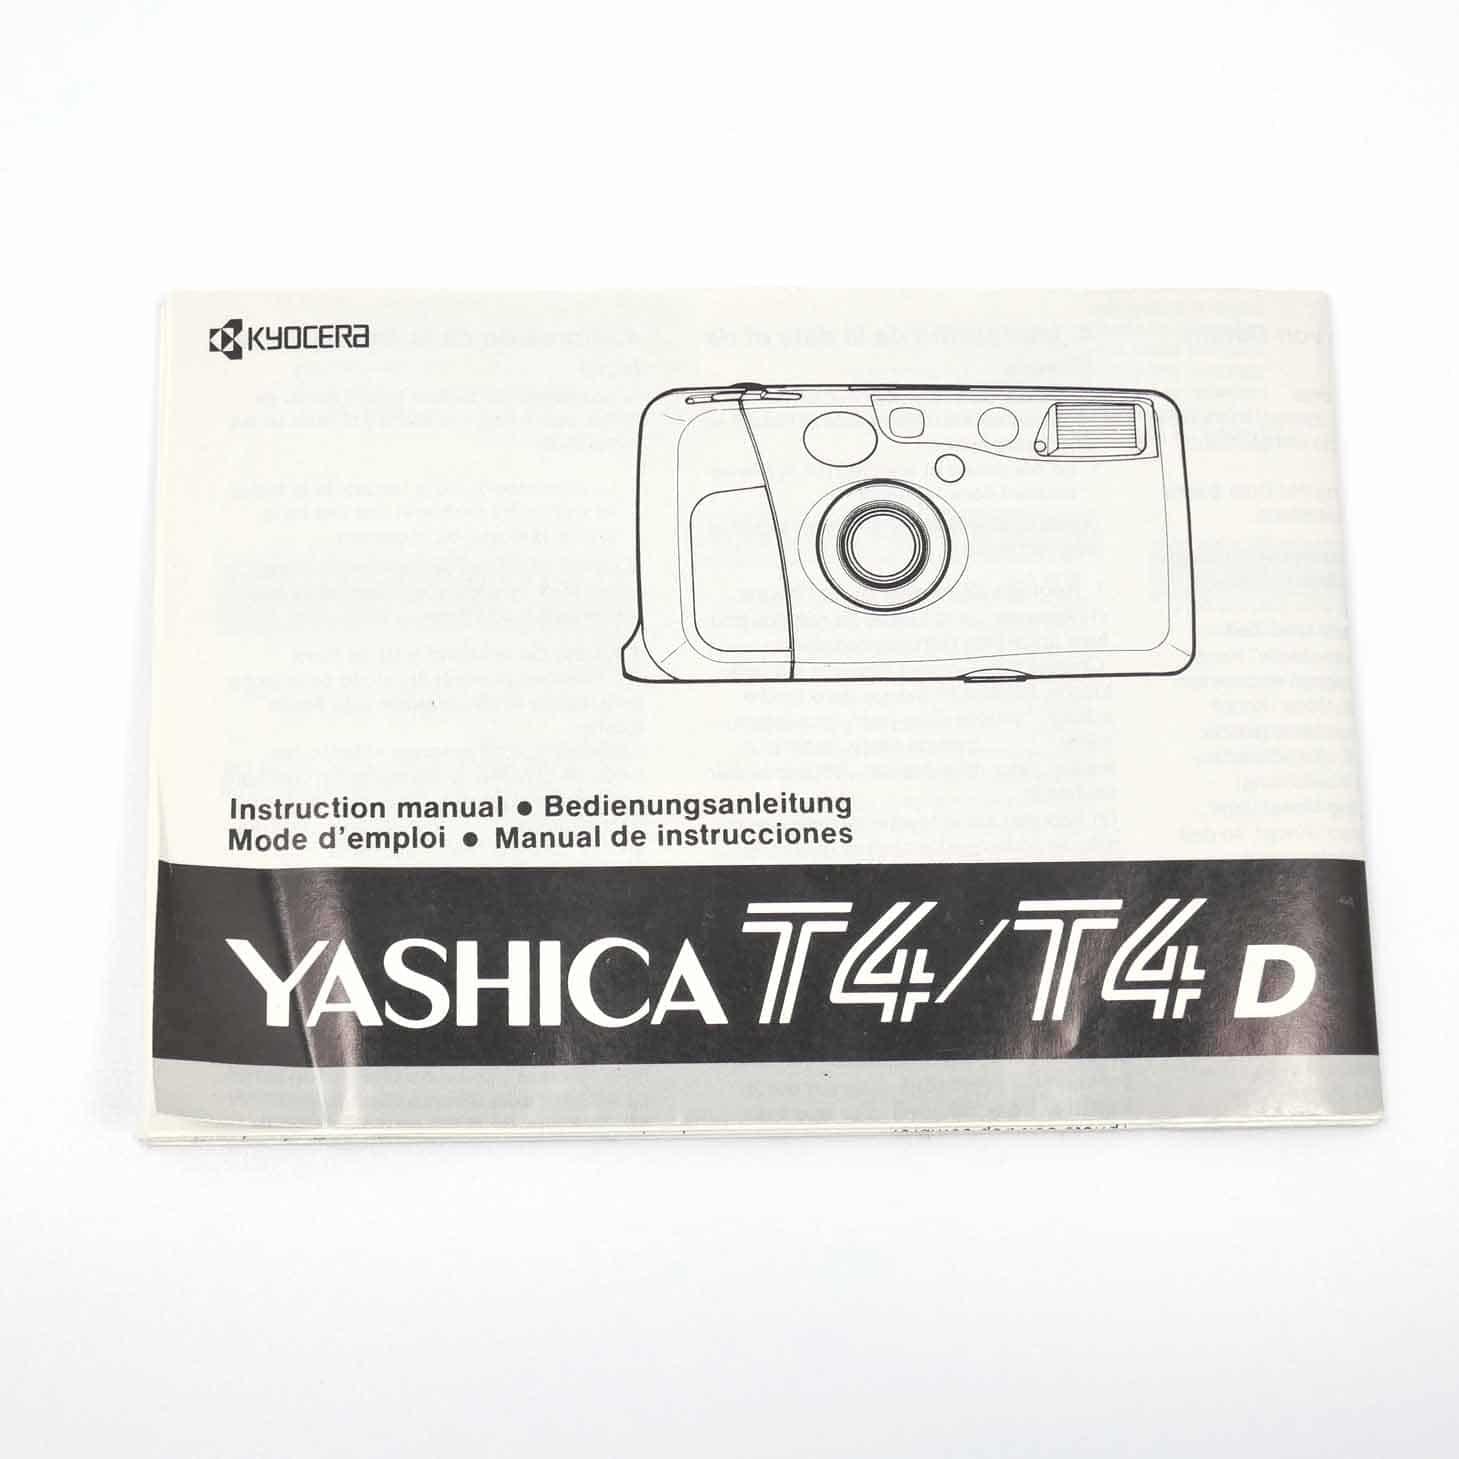 clean-cameras-Yashica-T4-Safari-01